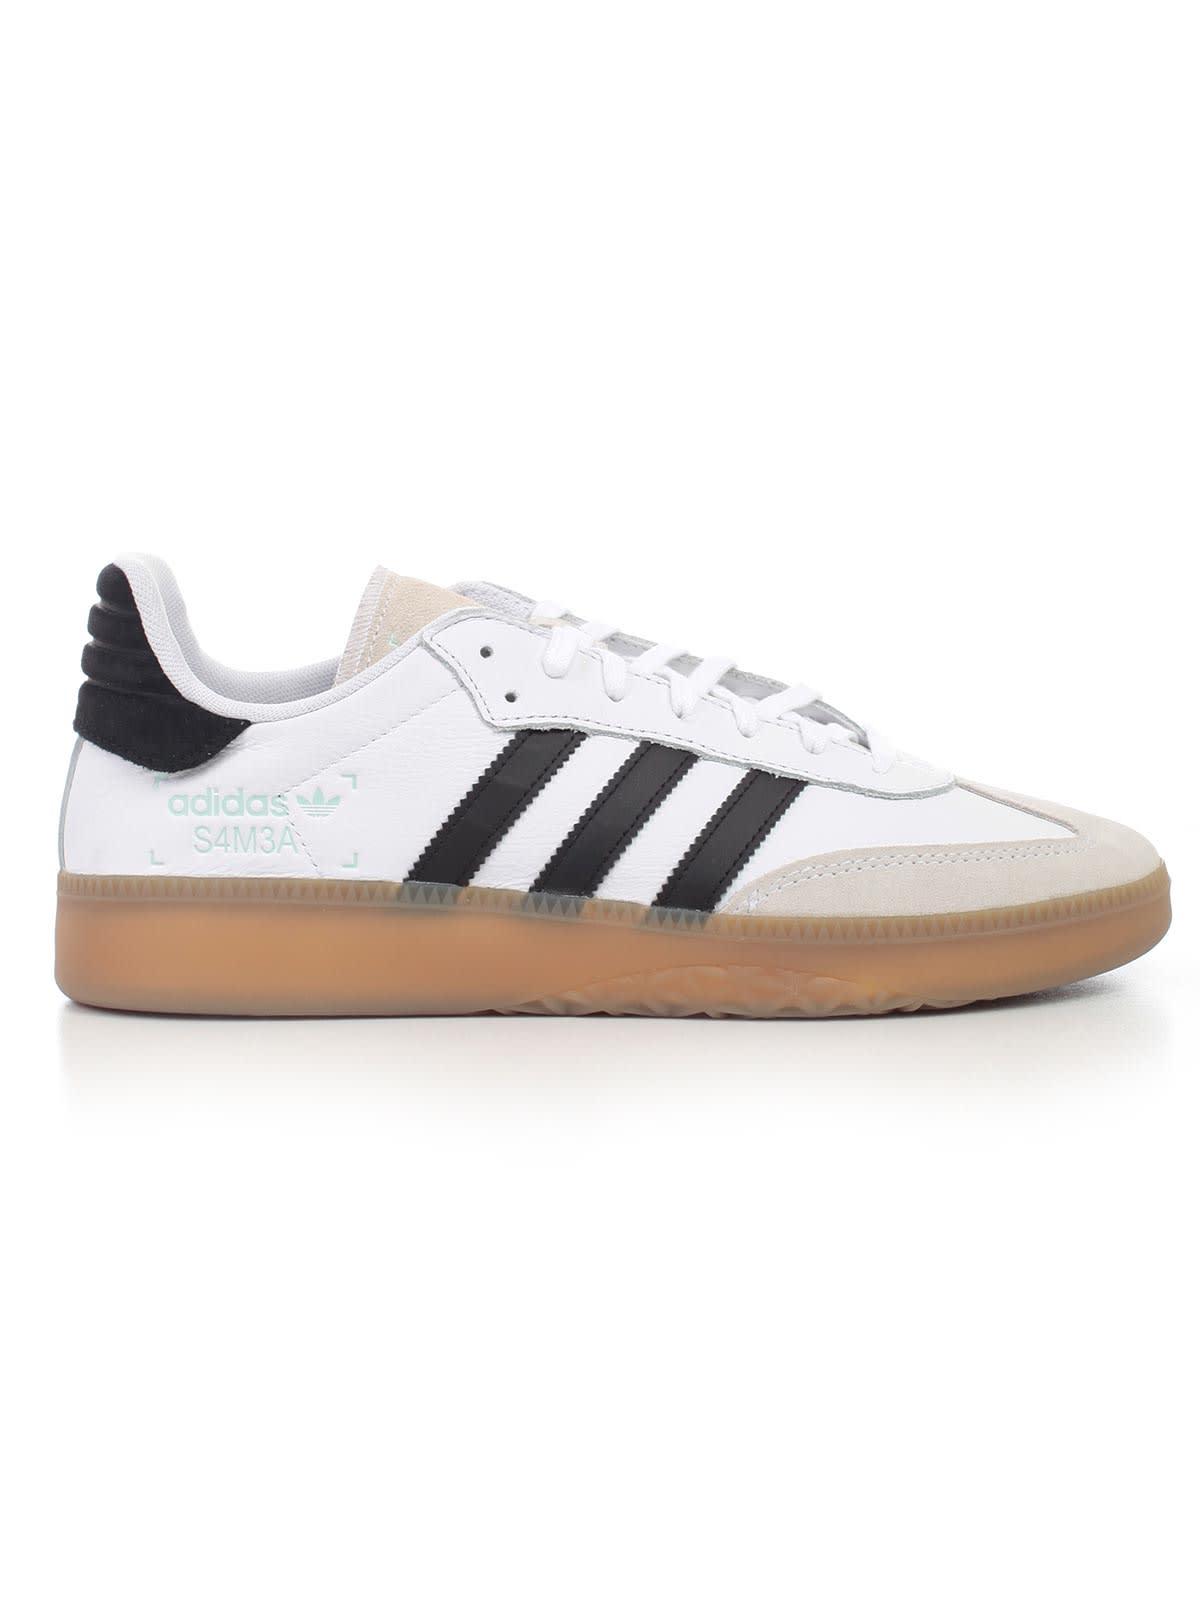 grande vente 7697f 8be2e Adidas Originals Old Era Sneakers